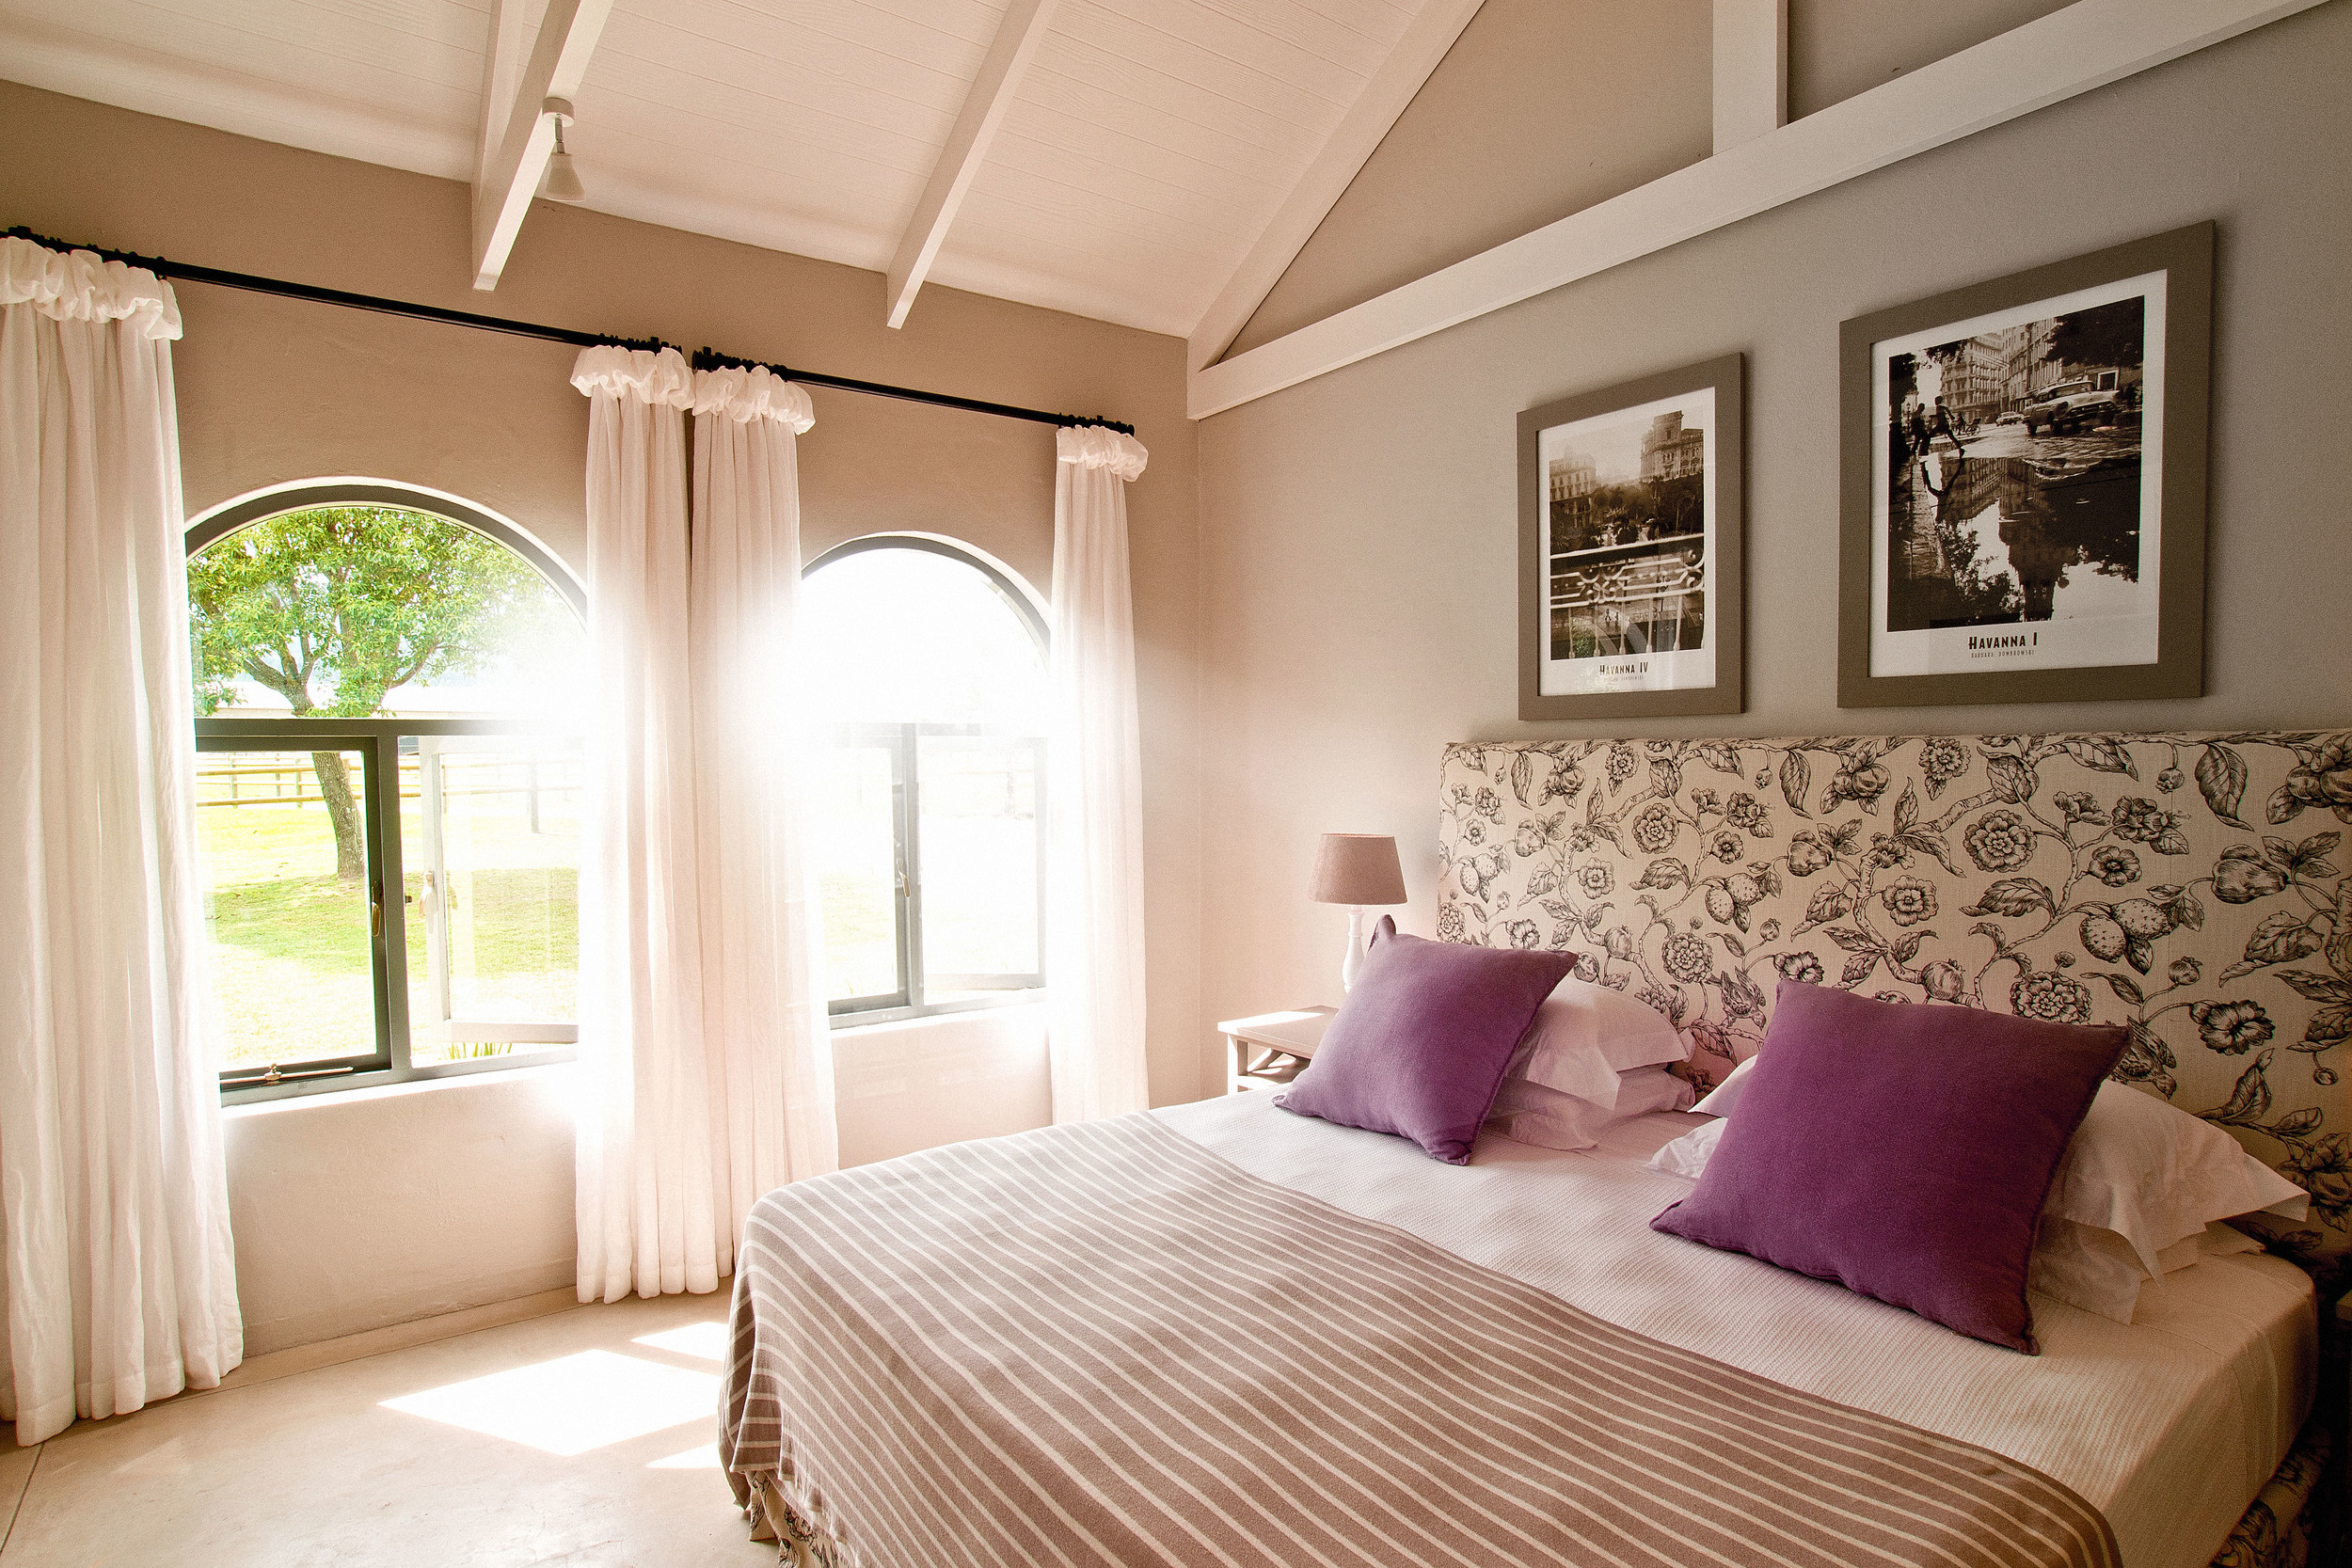 Rare Earth_Country House_Bedroom.jpg